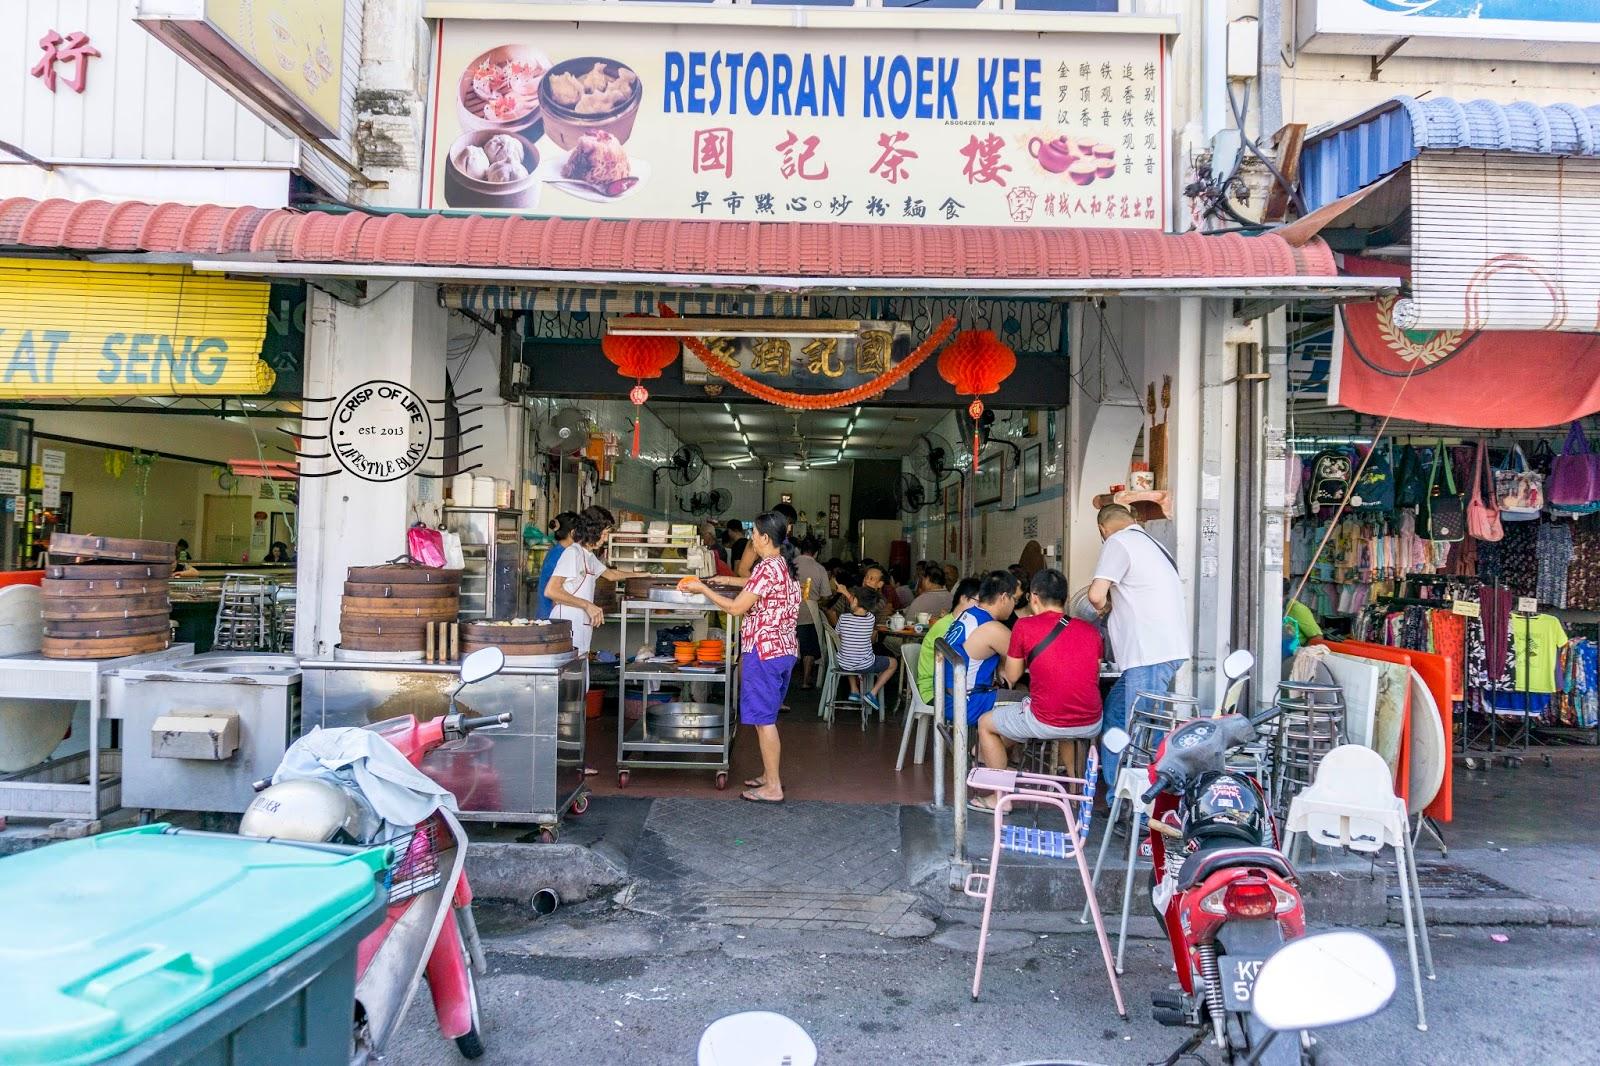 Koek Kee Dim Sum 国记茶楼点心 Sungai Petani